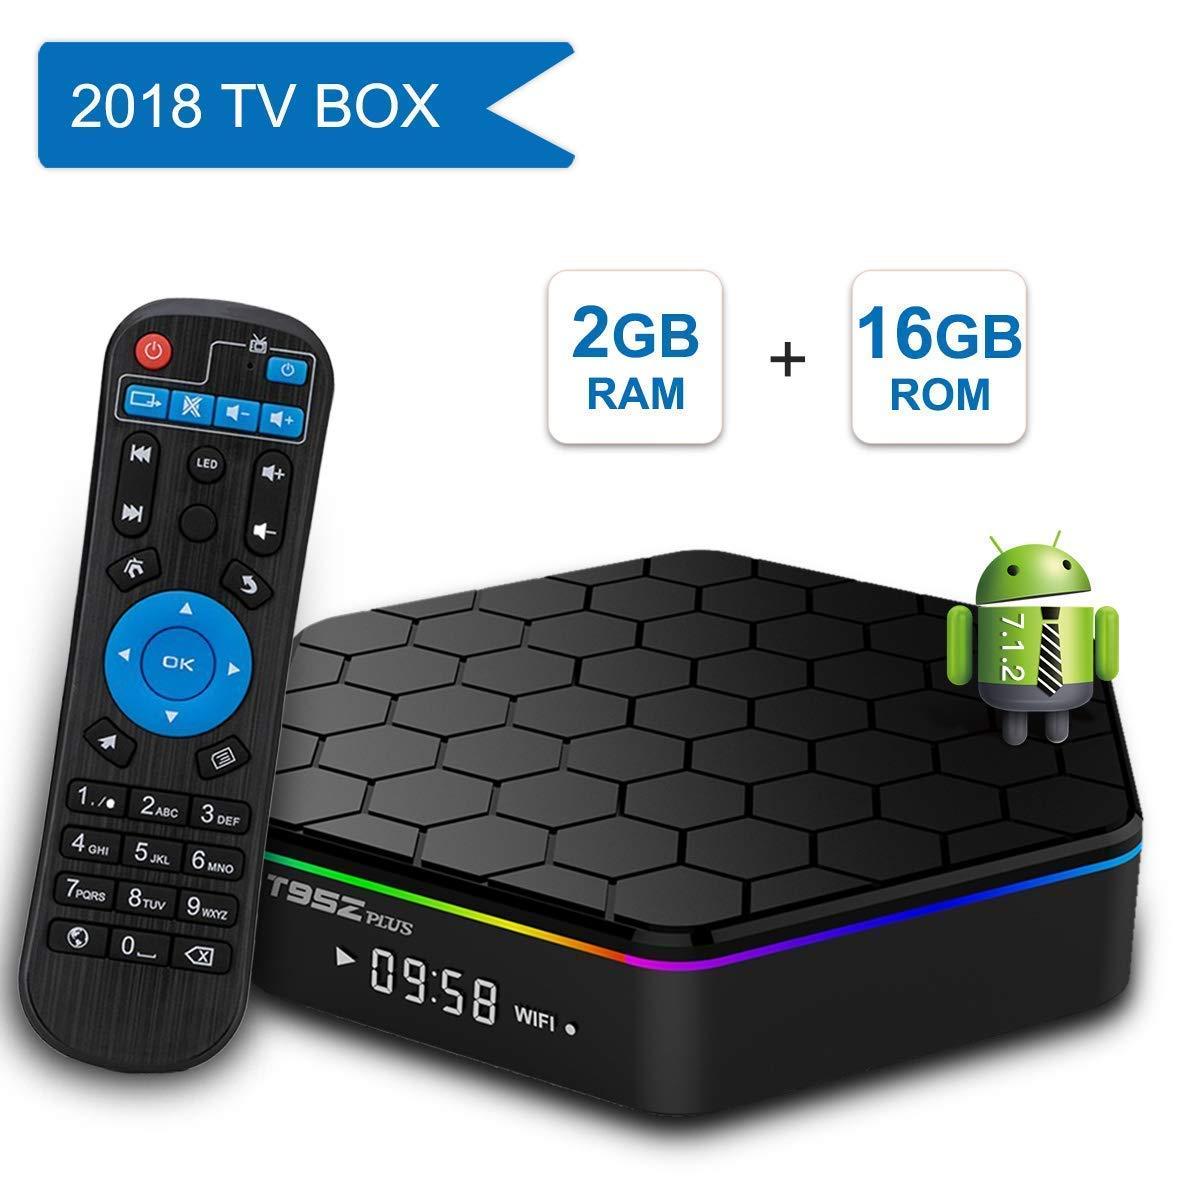 YAOWWY 2GB RAM 16GB ROM T95Z Plus Amlogic S912 Octa Core Android TV Box Media Player 4K HD 2.4G&5G WiFi BT4.0 Gigabit LAN Android 7.1 Smart TV Box: Amazon.es: Hogar